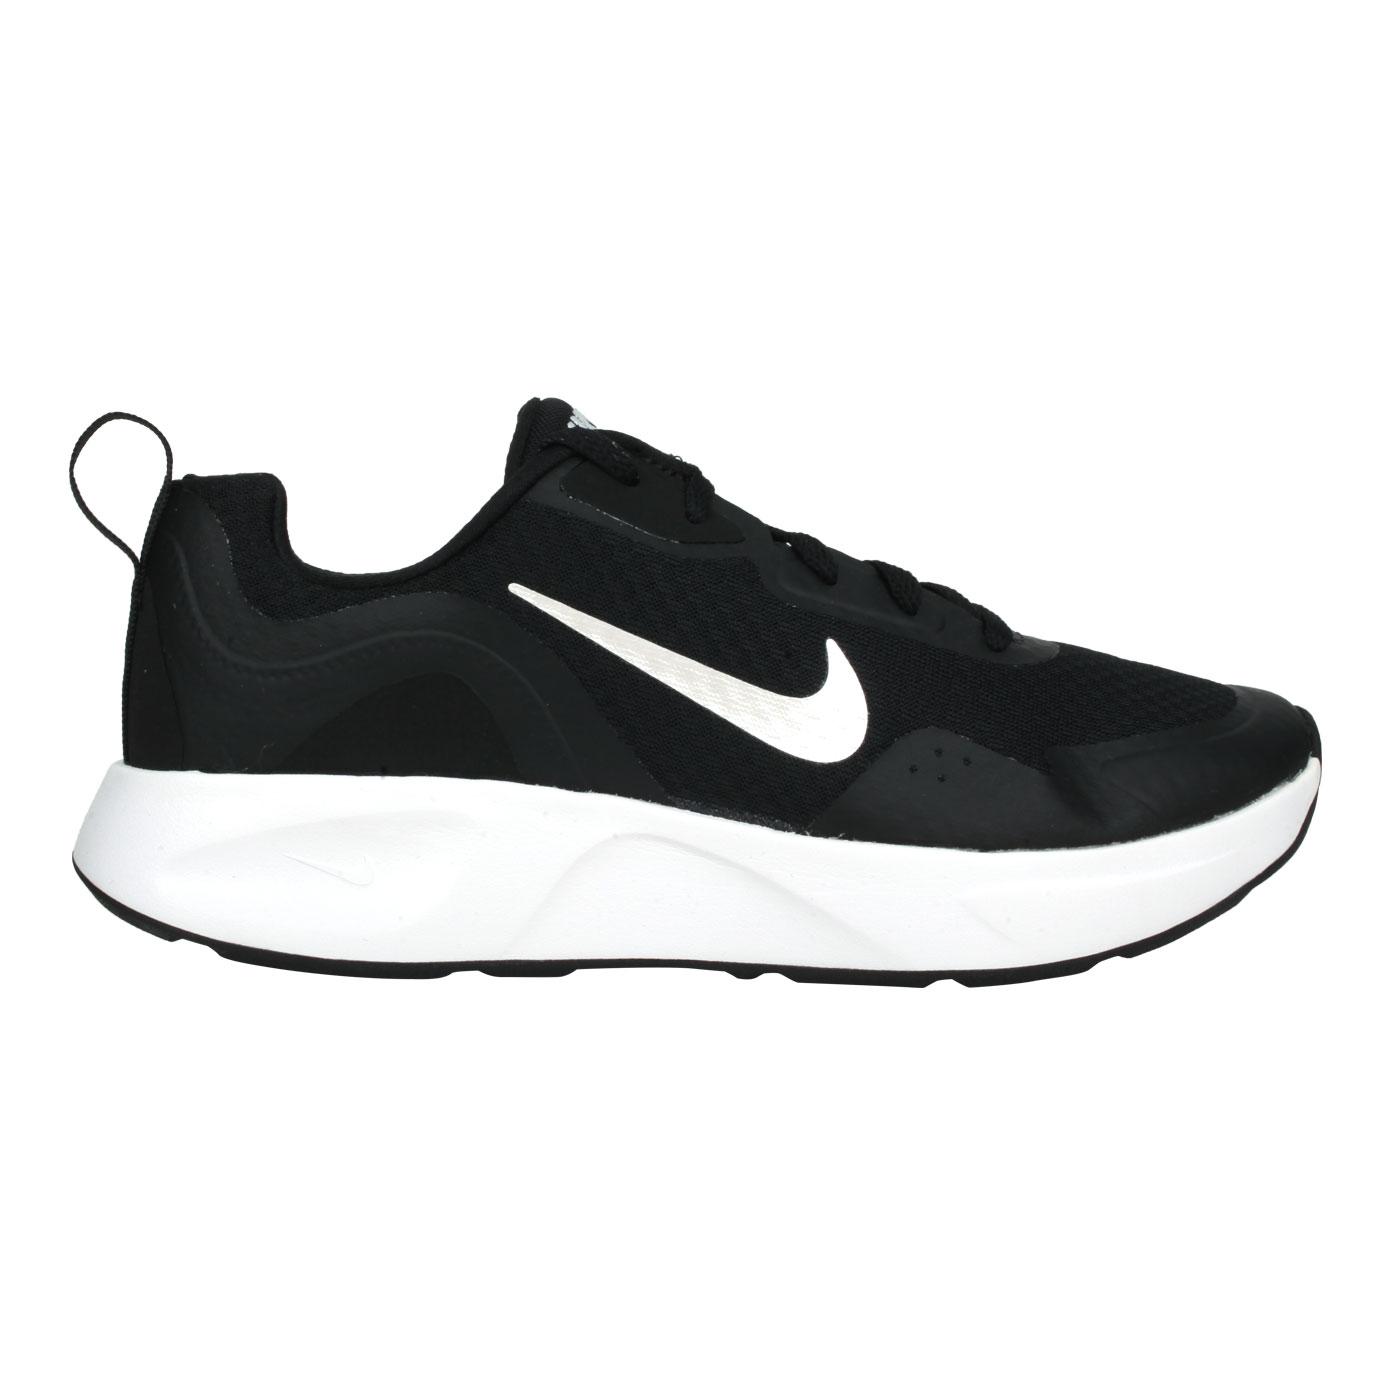 NIKE 女款休閒運動鞋   @WMNS WEARALLDAY@CJ1677001 - 黑白